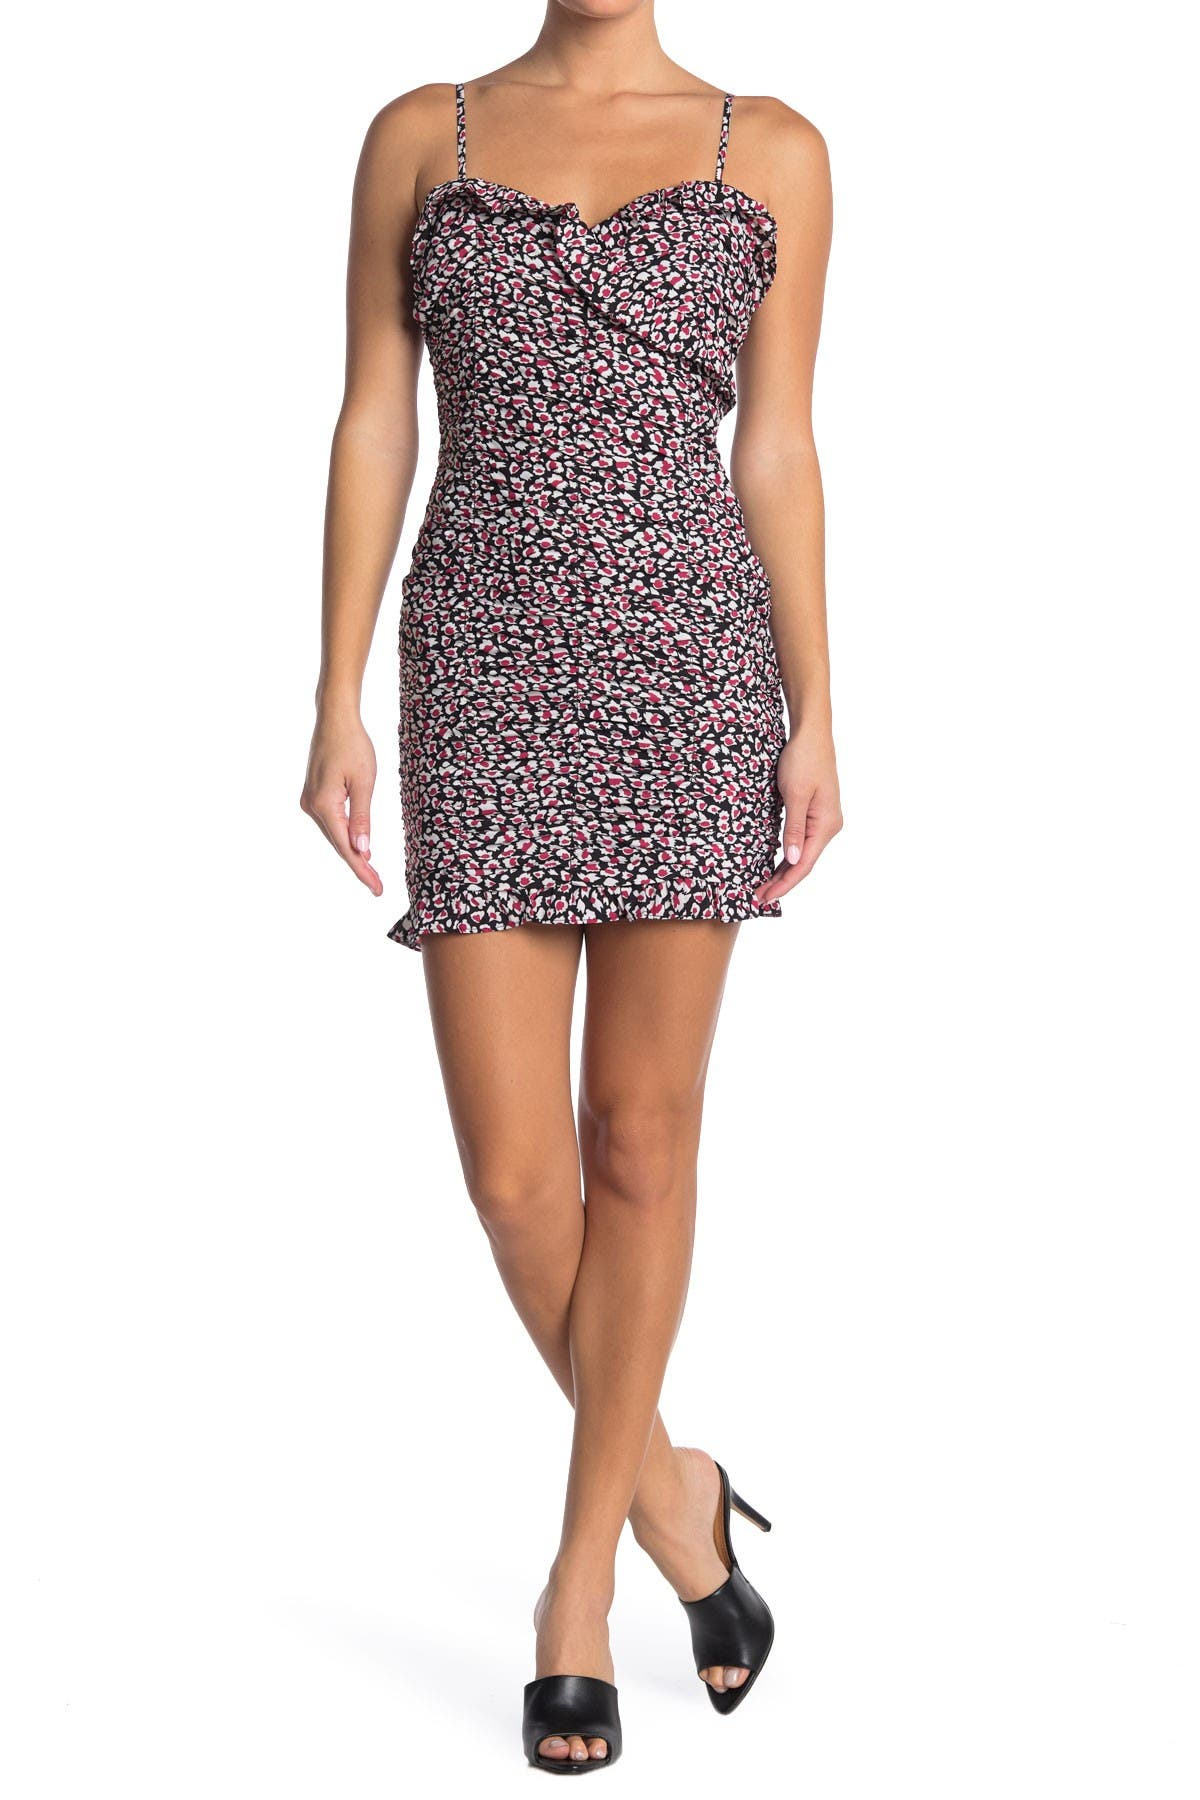 Image of Lush Printed Cami Ruched Mini Dress